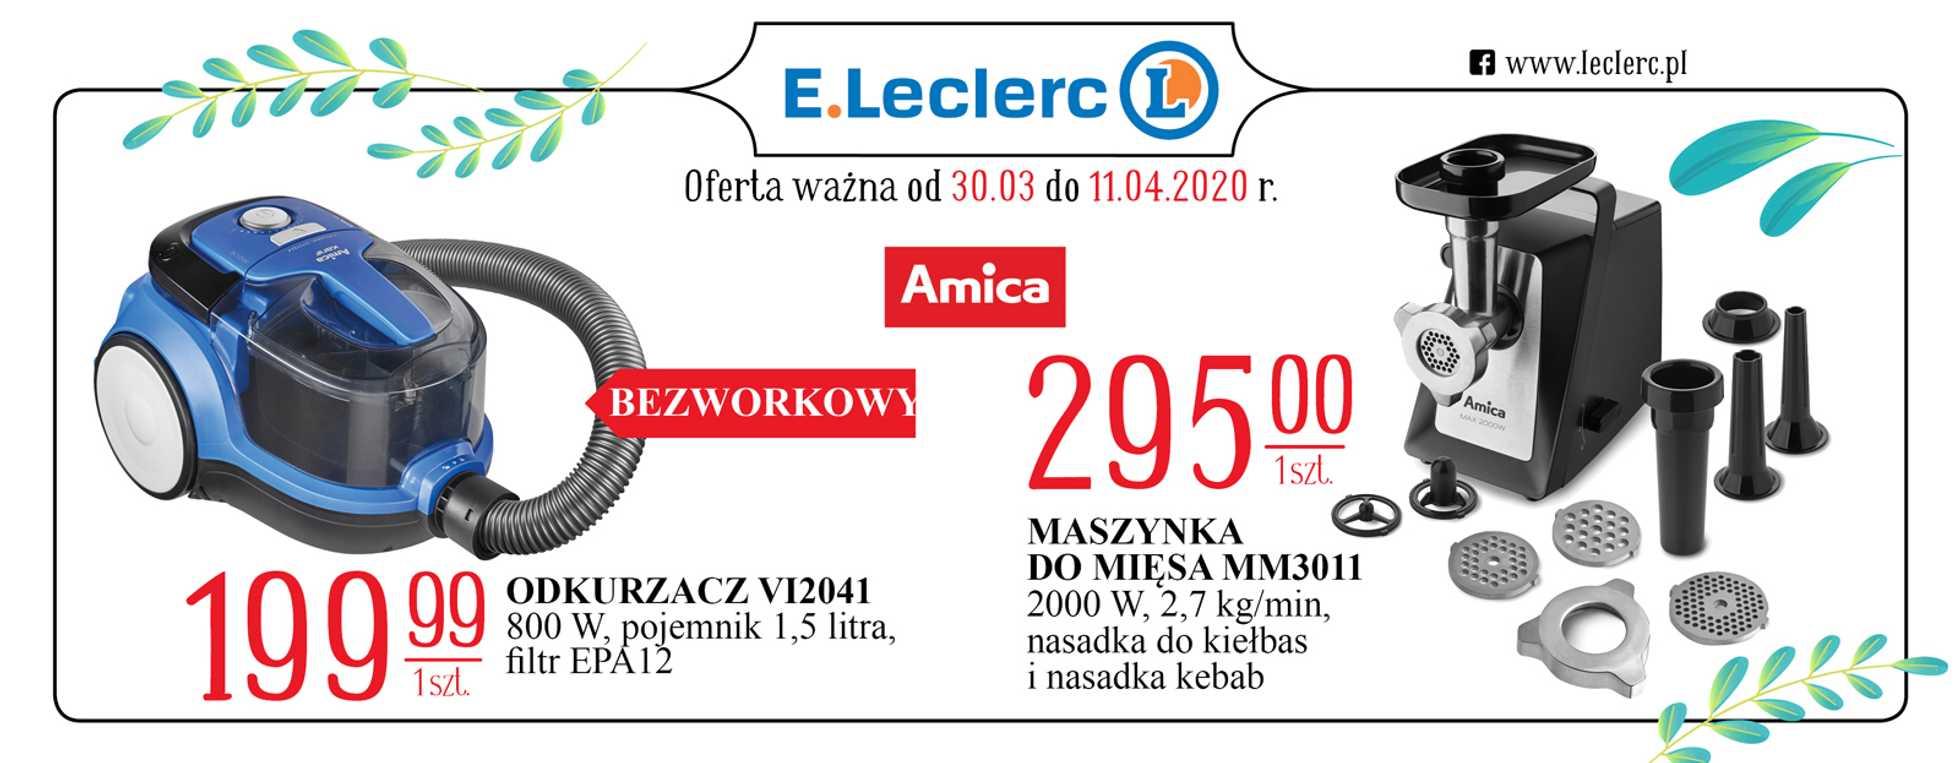 E.Leclerc - gazetka promocyjna ważna od 30.03.2020 do 11.04.2020 - strona 3.